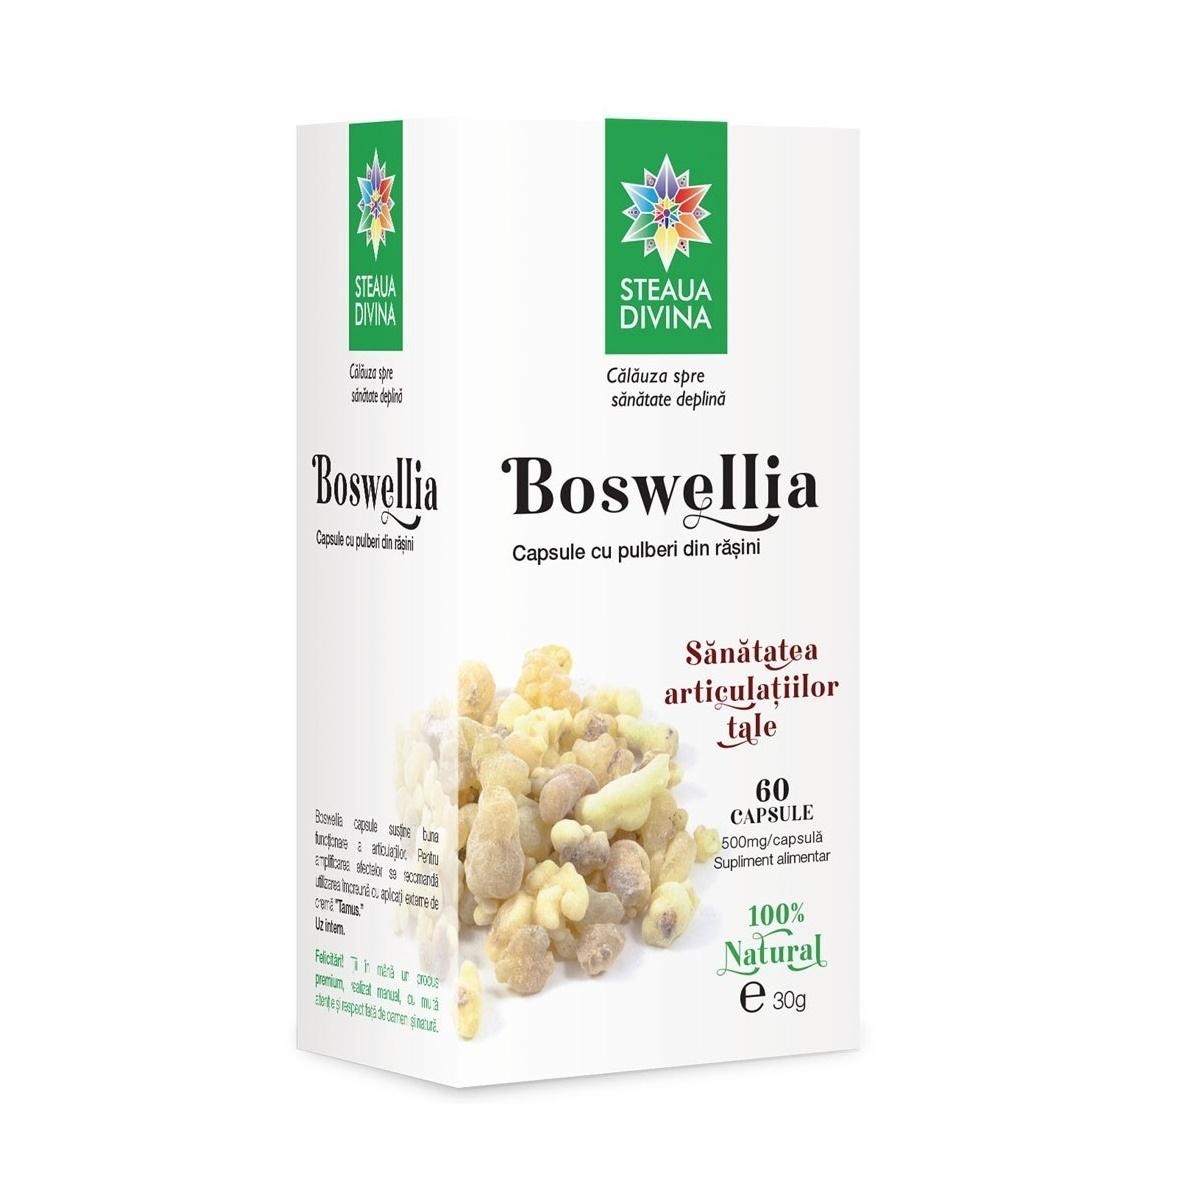 Boswellia, 60 capsule, Steaua Divină